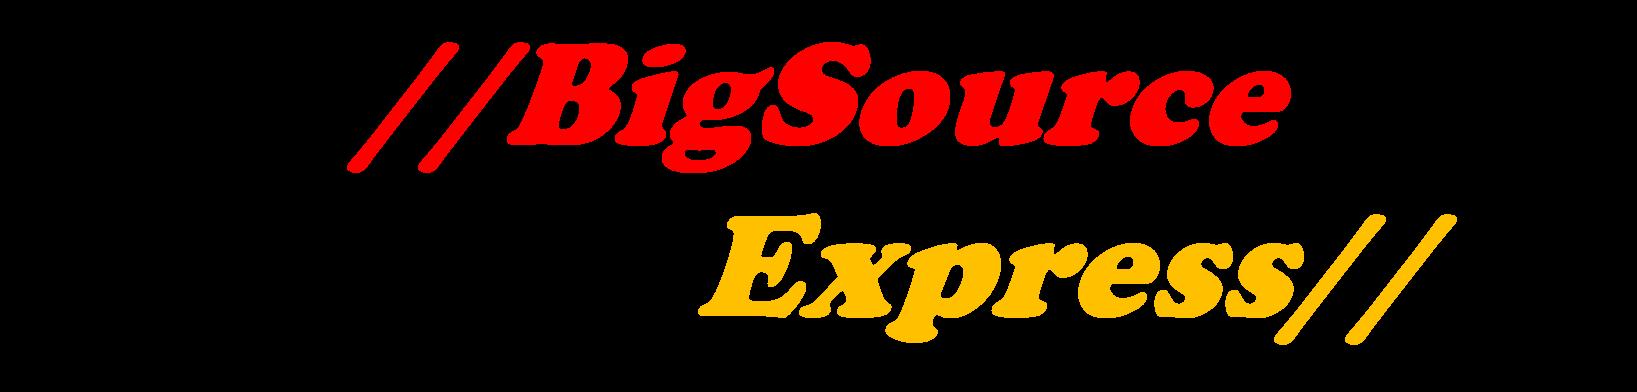 BigSource Basket